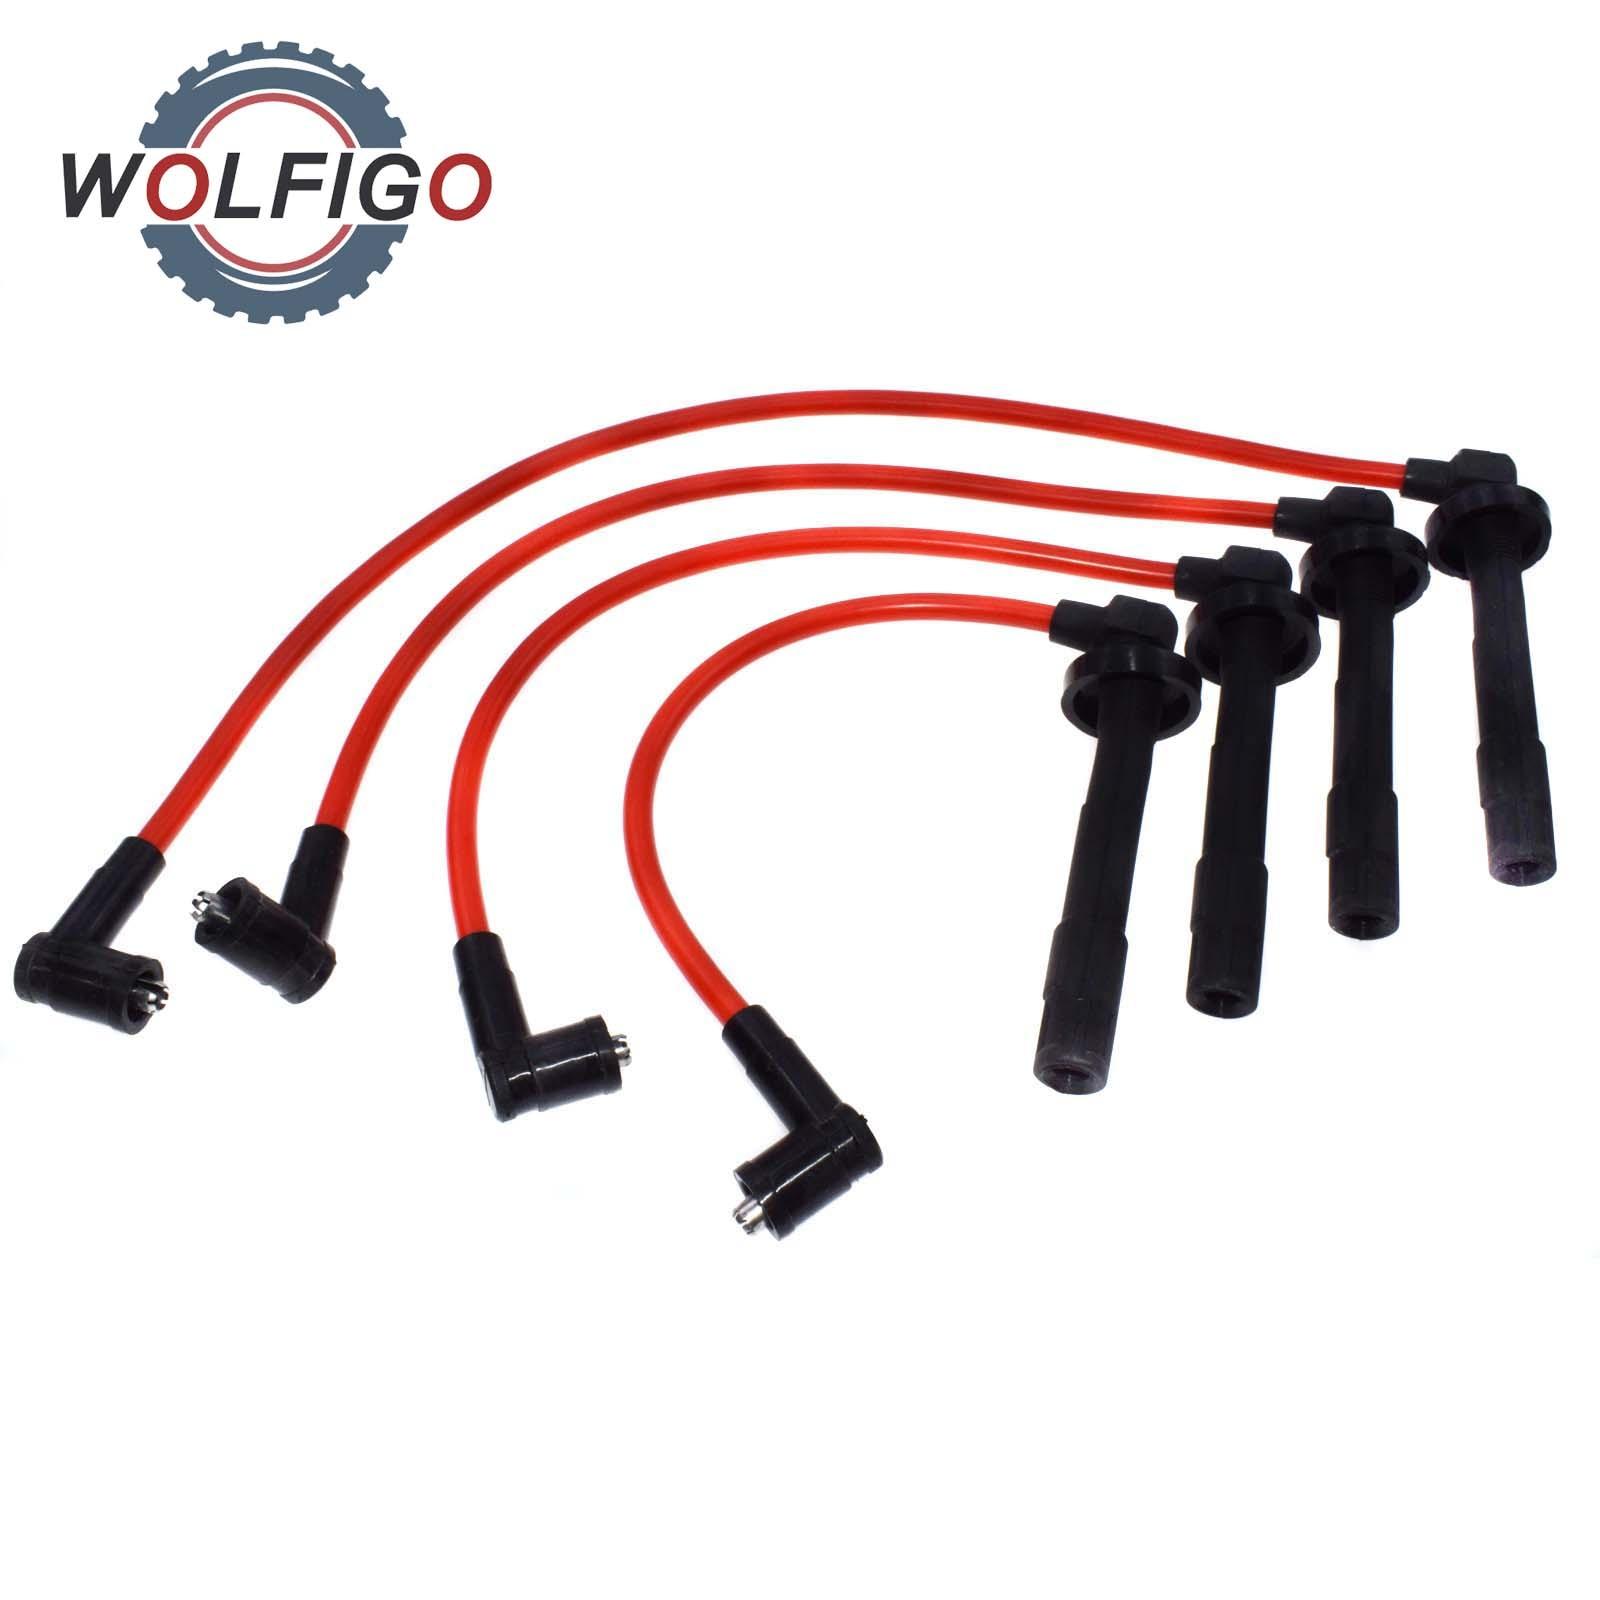 wolfigo 4 pcs ignition racing coil spark plug wires 8034. Black Bedroom Furniture Sets. Home Design Ideas